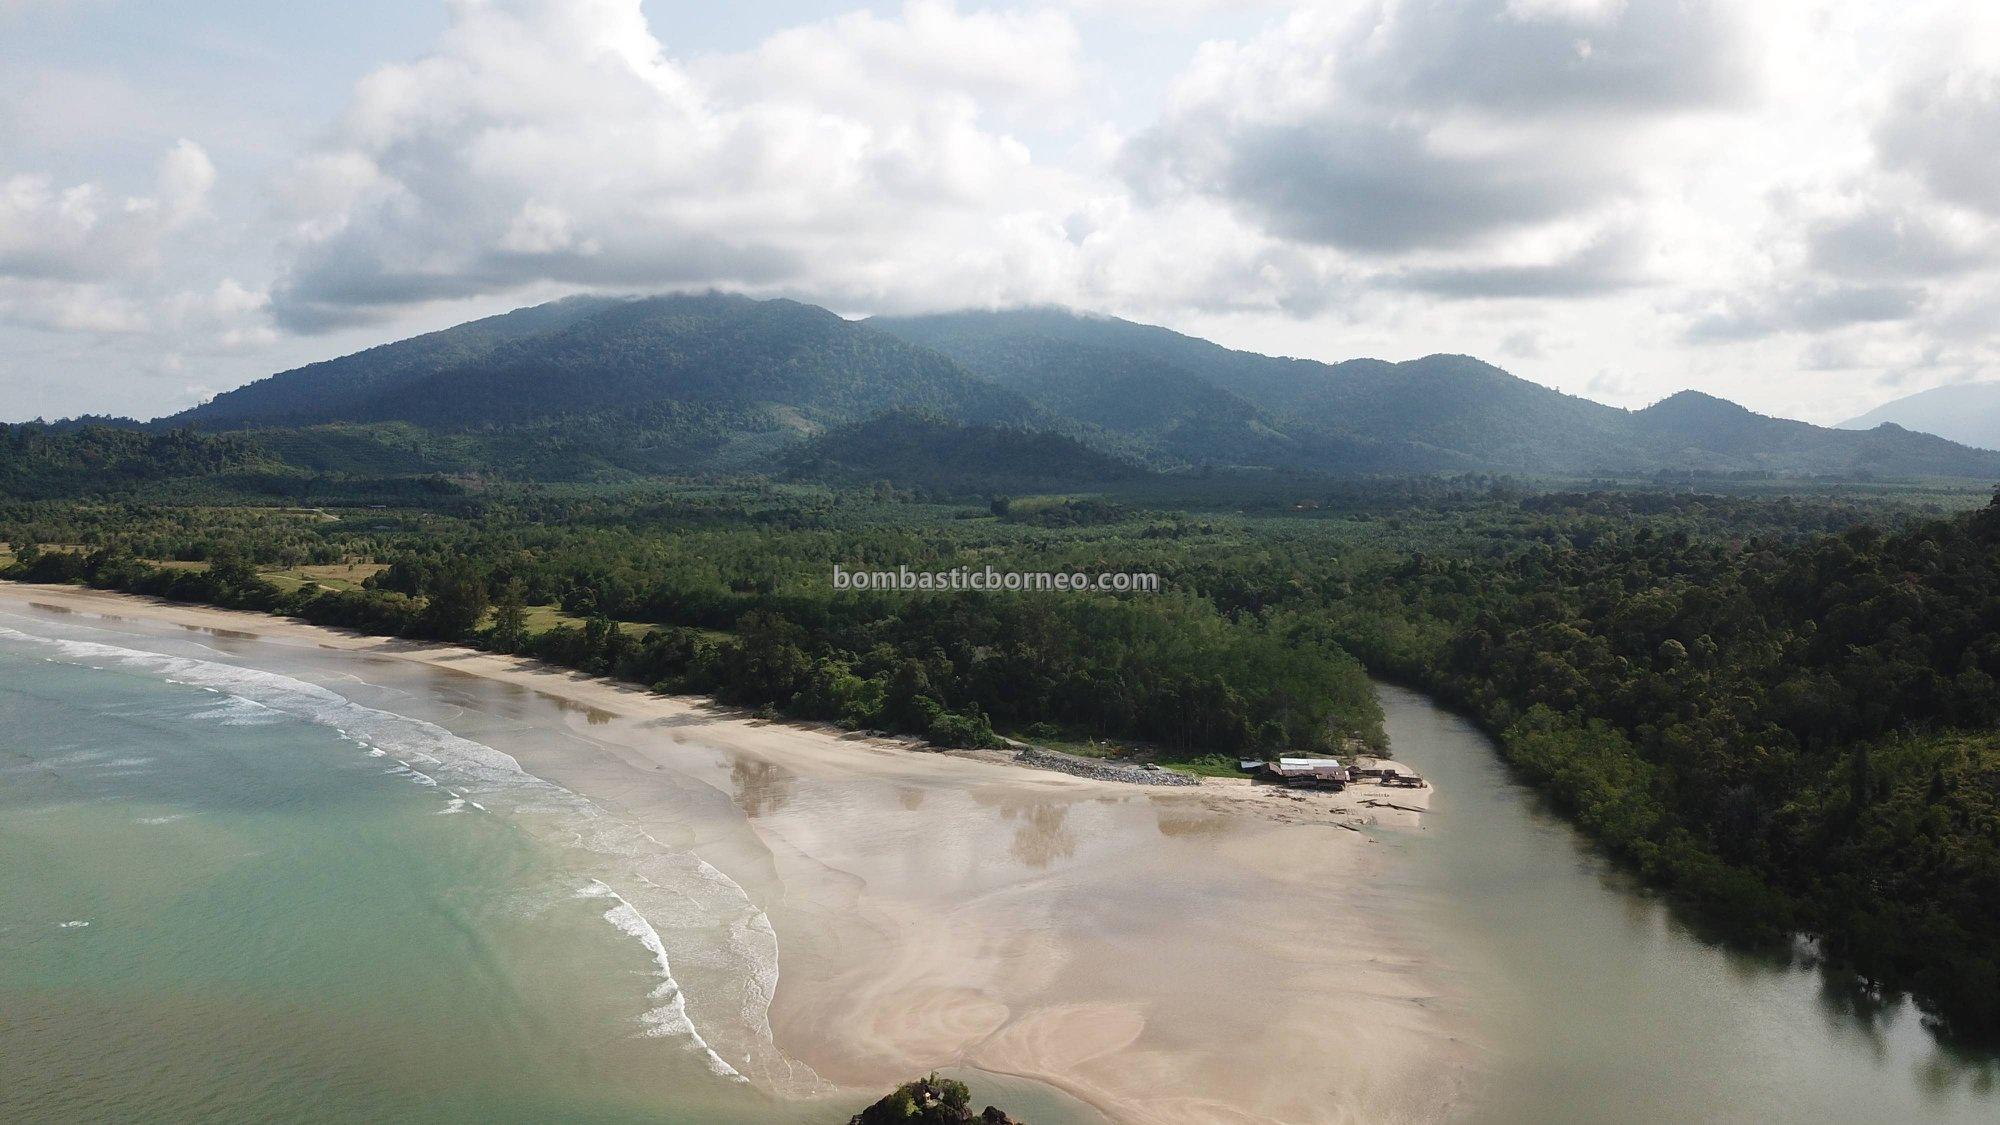 Bukit Gondol, Kampung Pugu, Beach, adventure, nature, outdoor, backpackers, exploration, family vacation, Borneo, Tourism, tourist attraction, transborder, 古晋伦乐海滩, 砂拉越婆罗洲